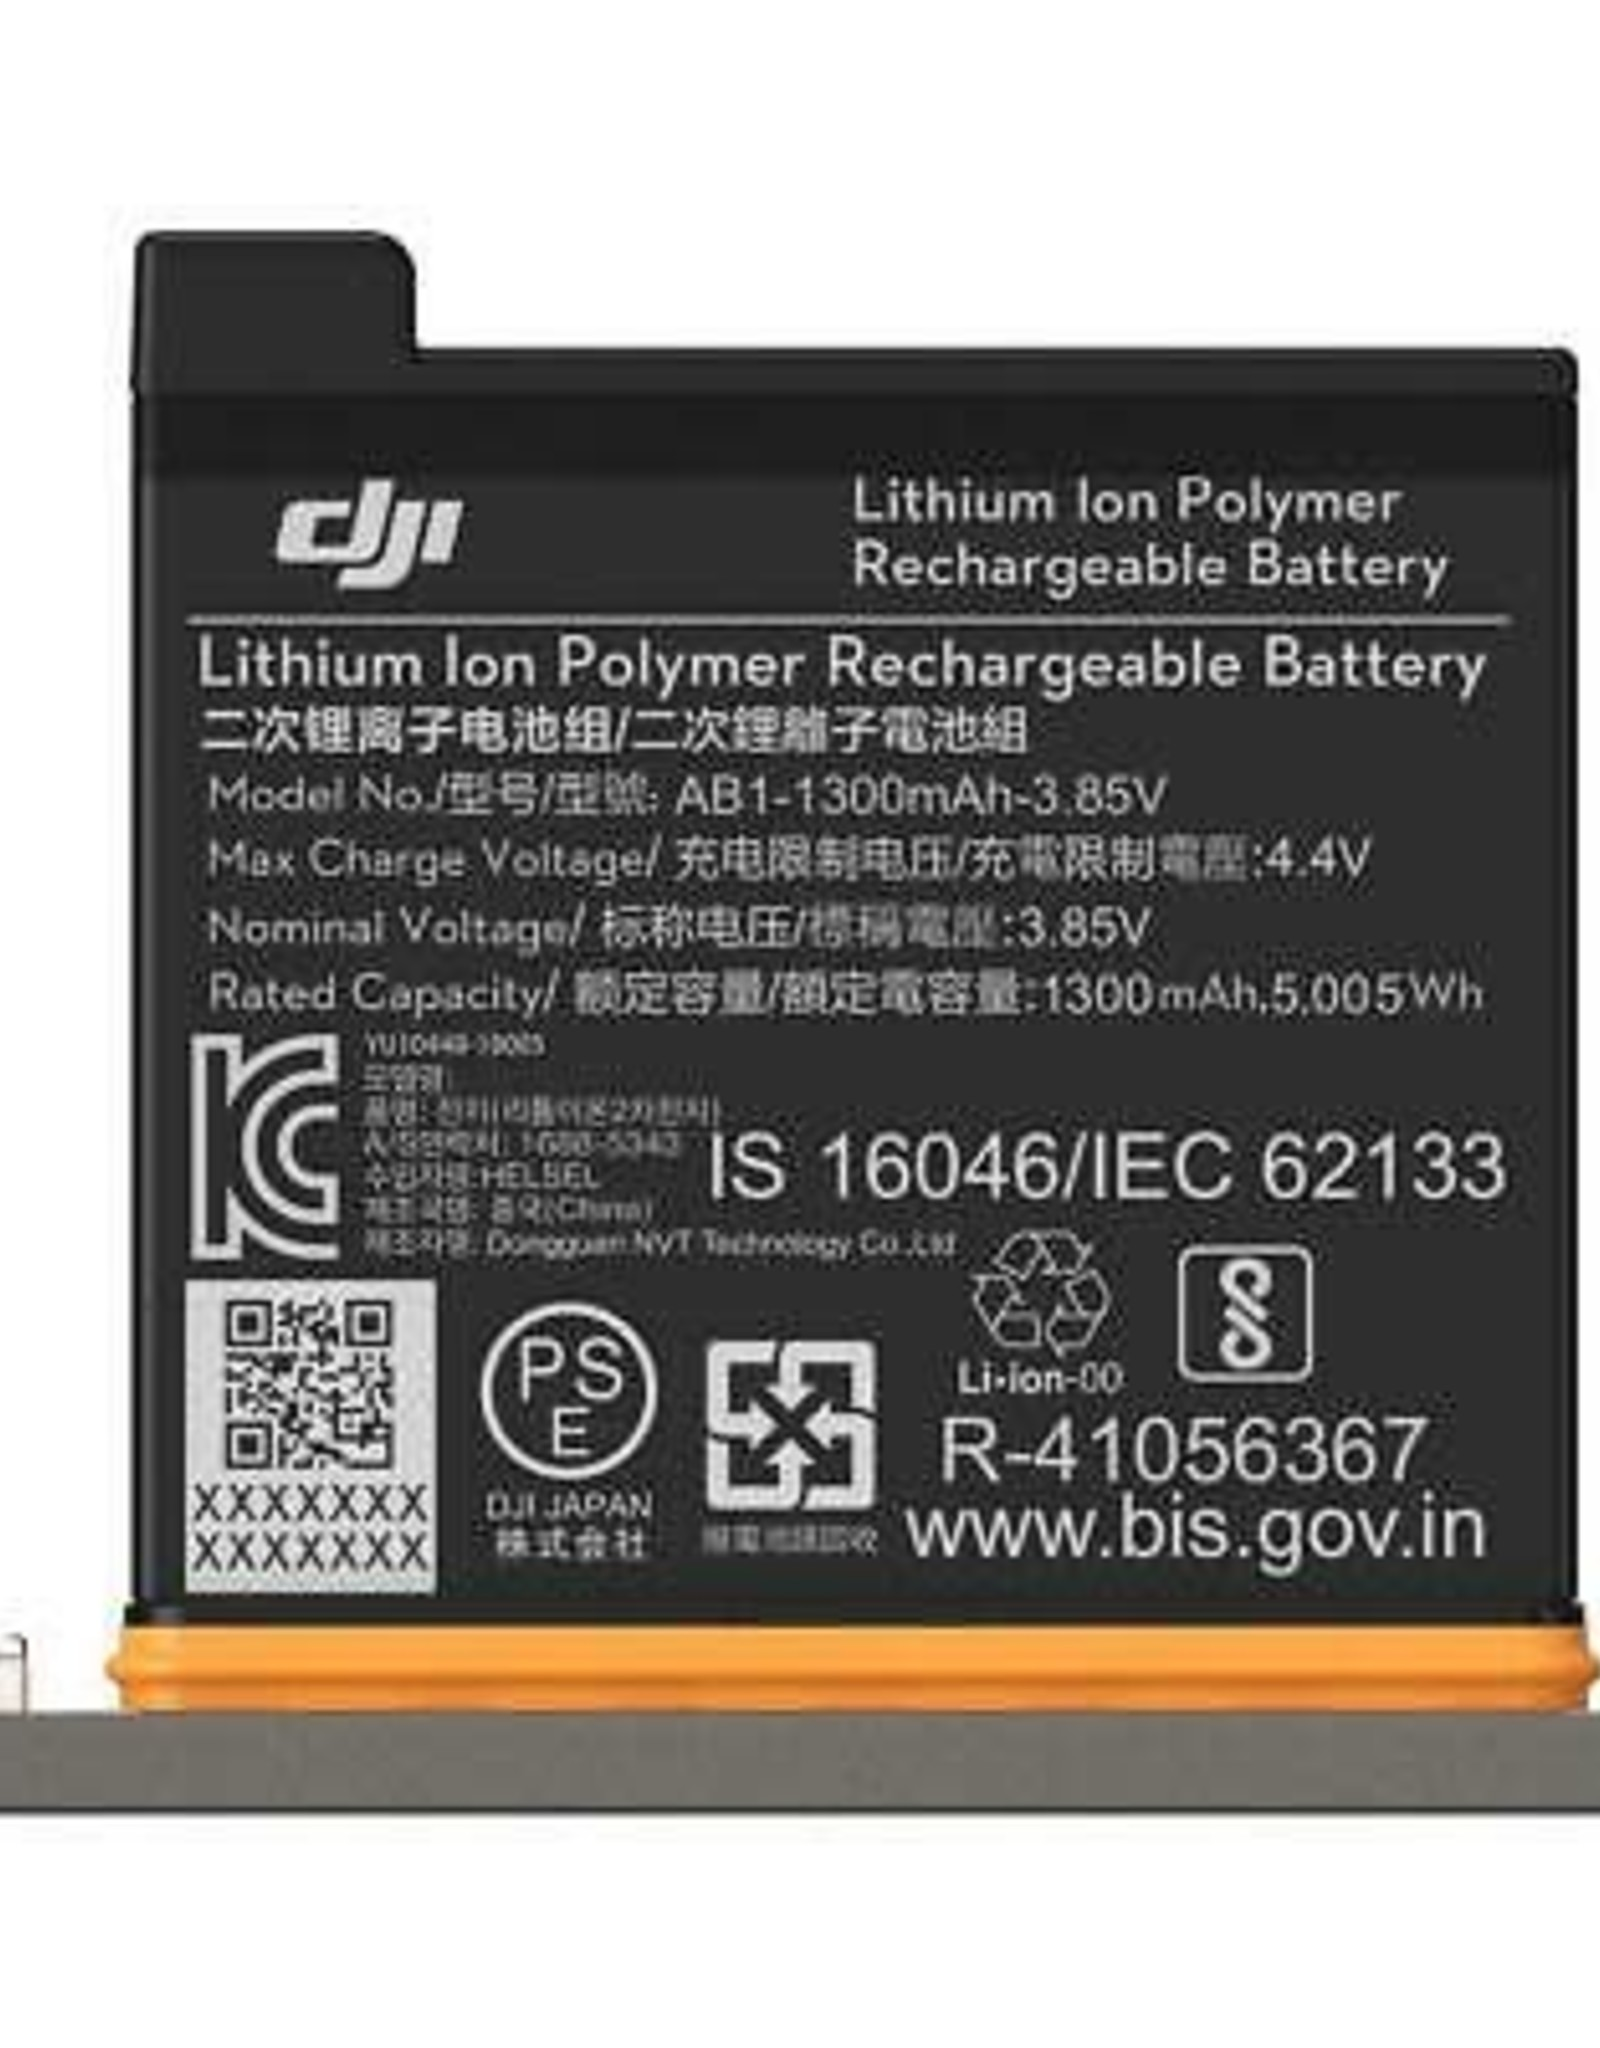 DJI DJI Osmo Action Part 1 Battery